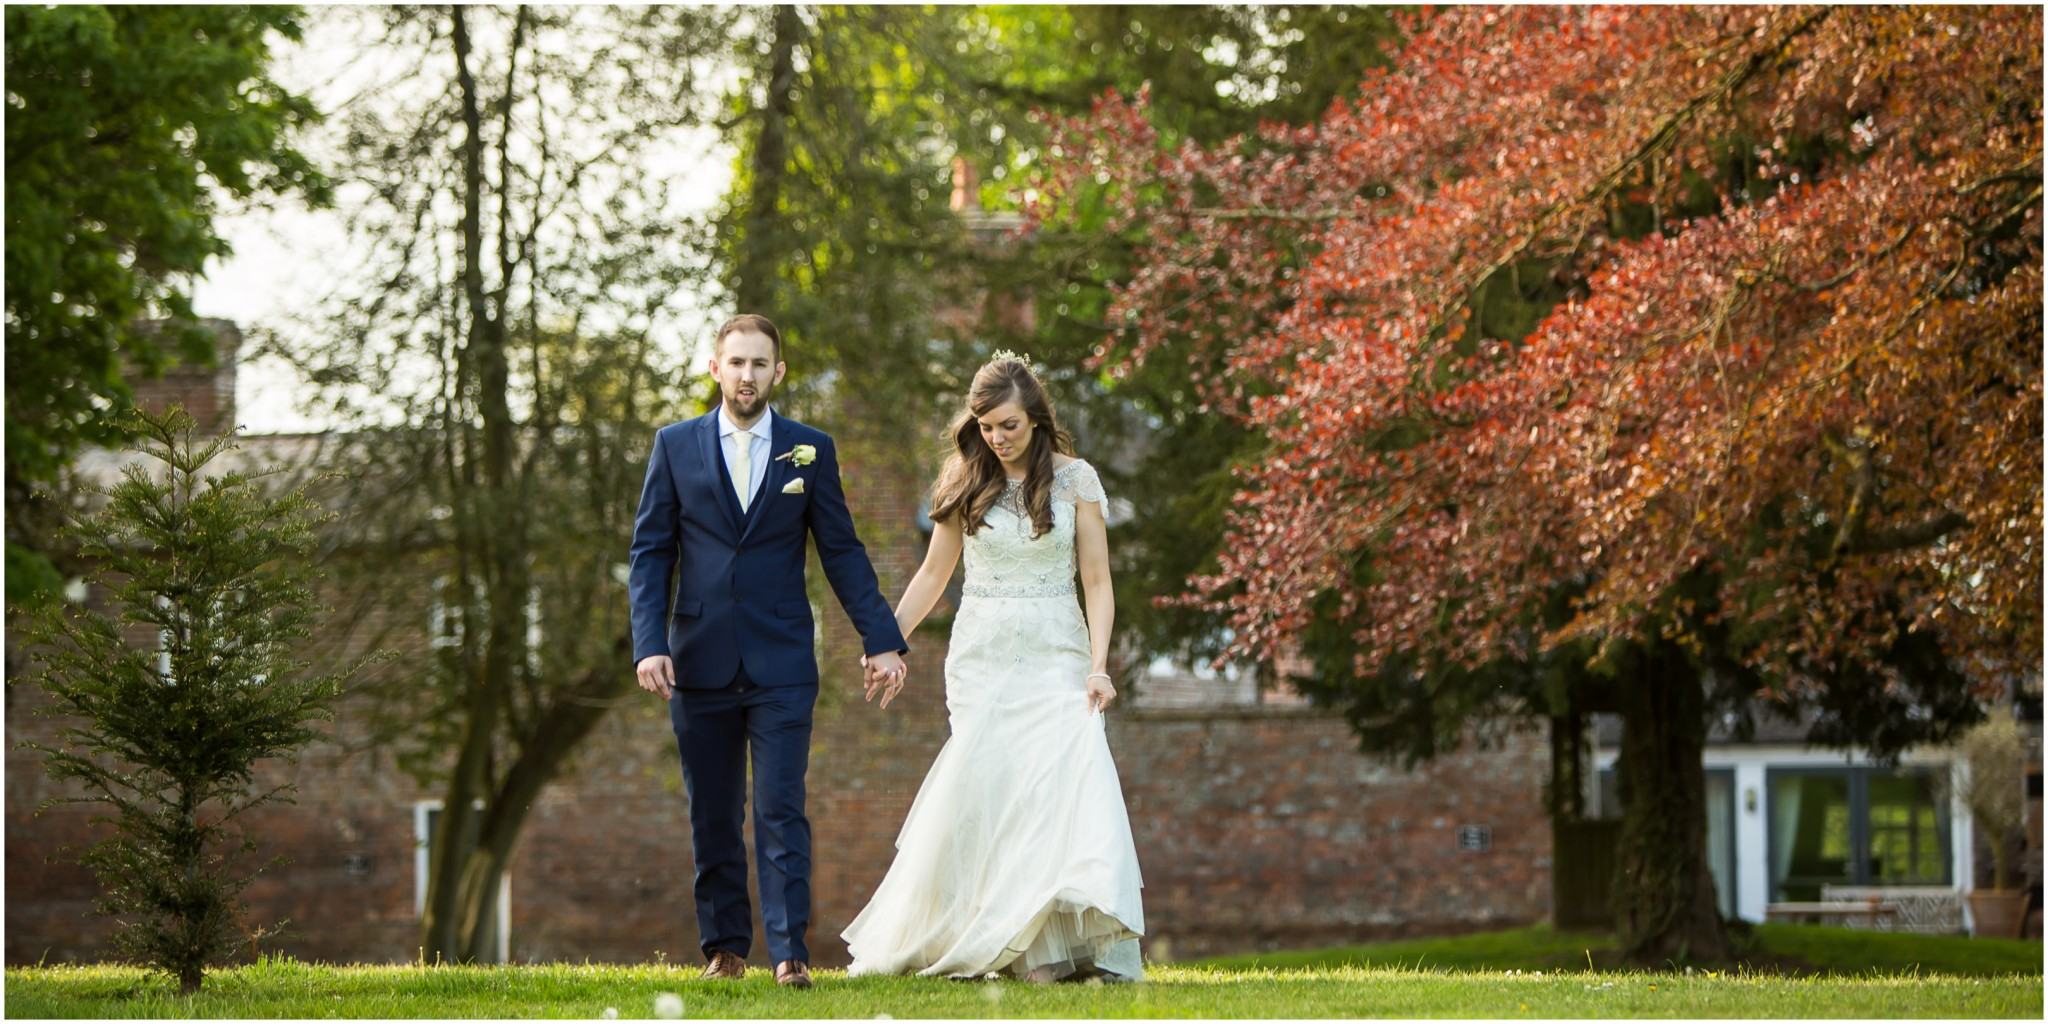 Wasing Park Wedding Photography Bride & Groom walking in the gardens